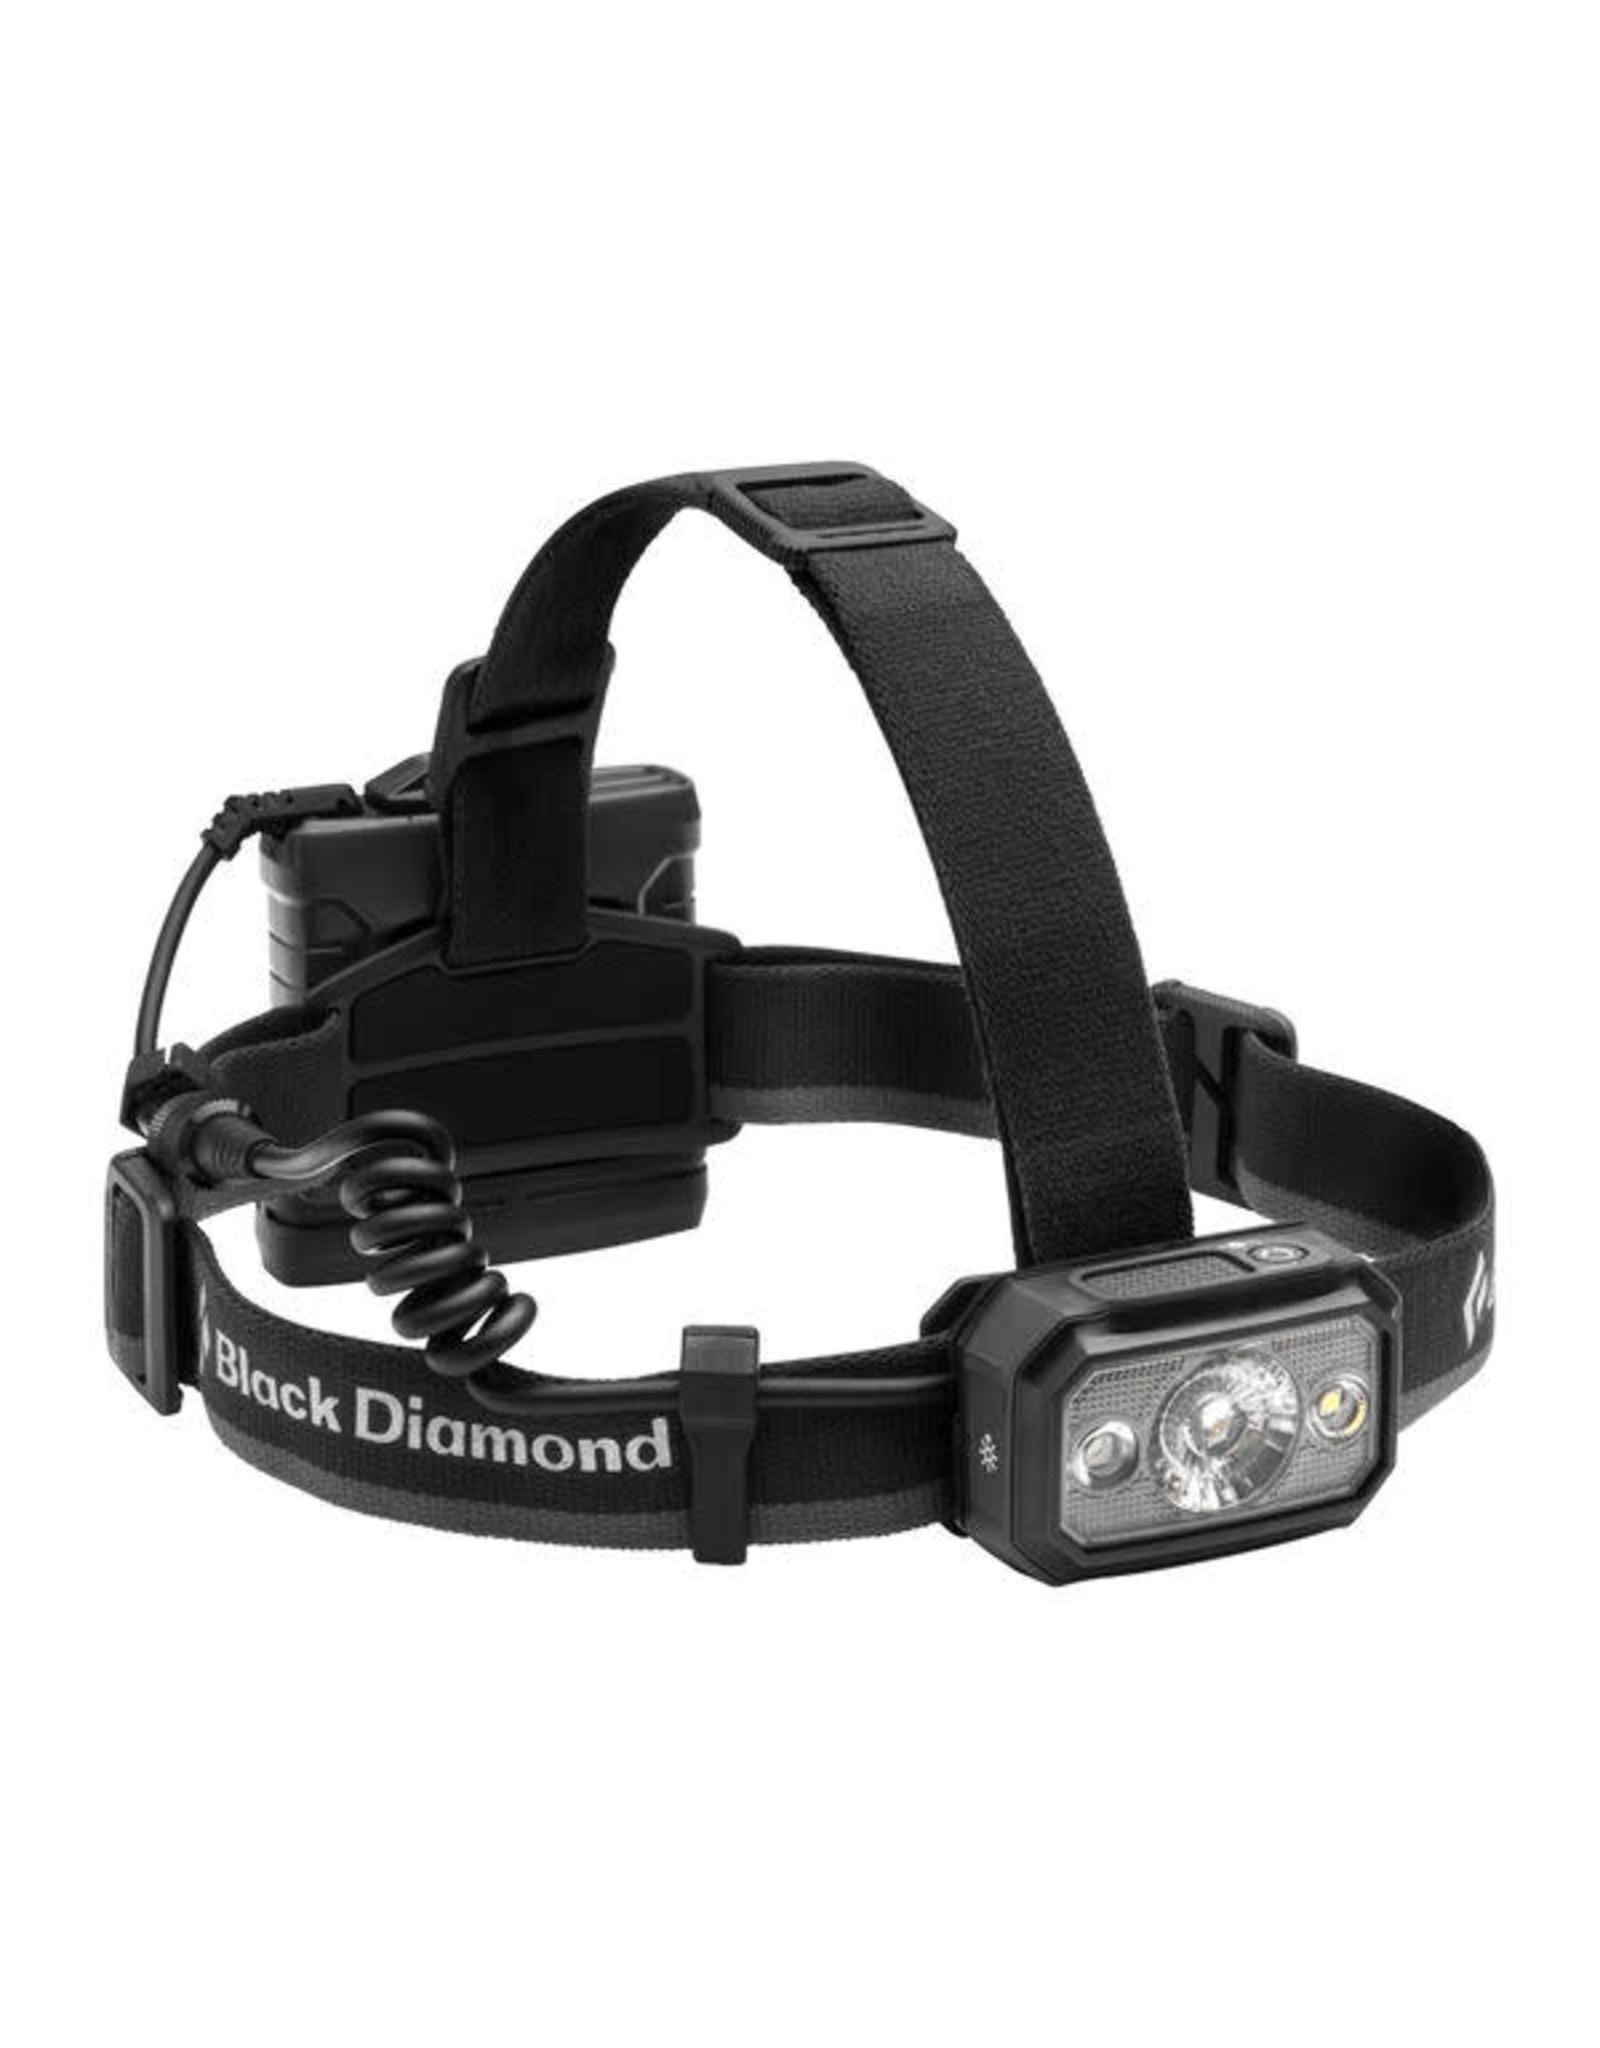 Black Diamond Black Diamond - Lampe frontale icon 700 graphite